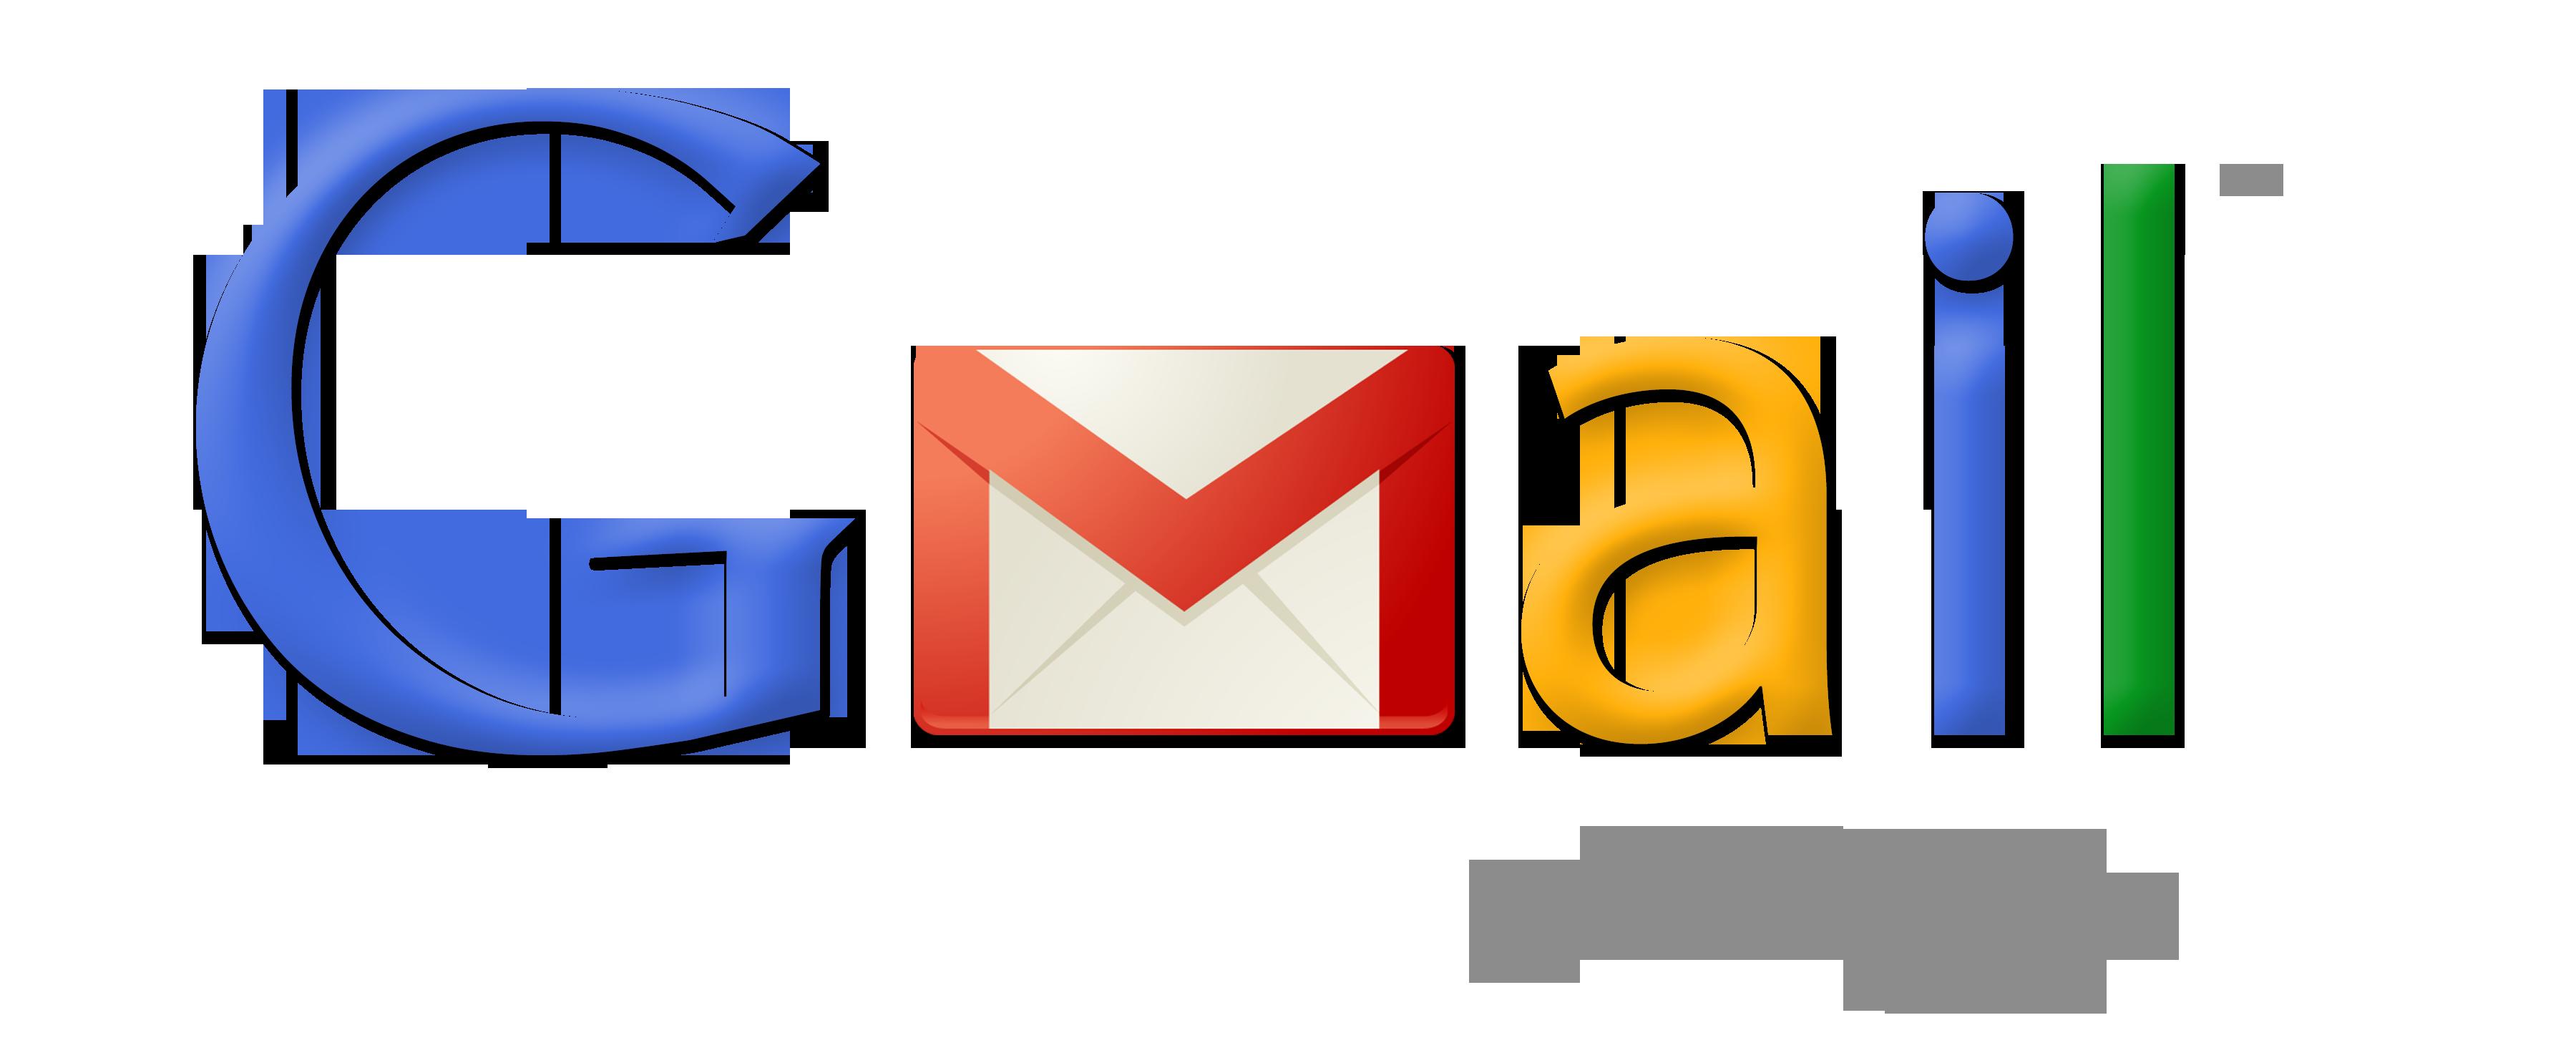 Google Mail Png Hdpng.com 3600 - Google Mail, Transparent background PNG HD thumbnail